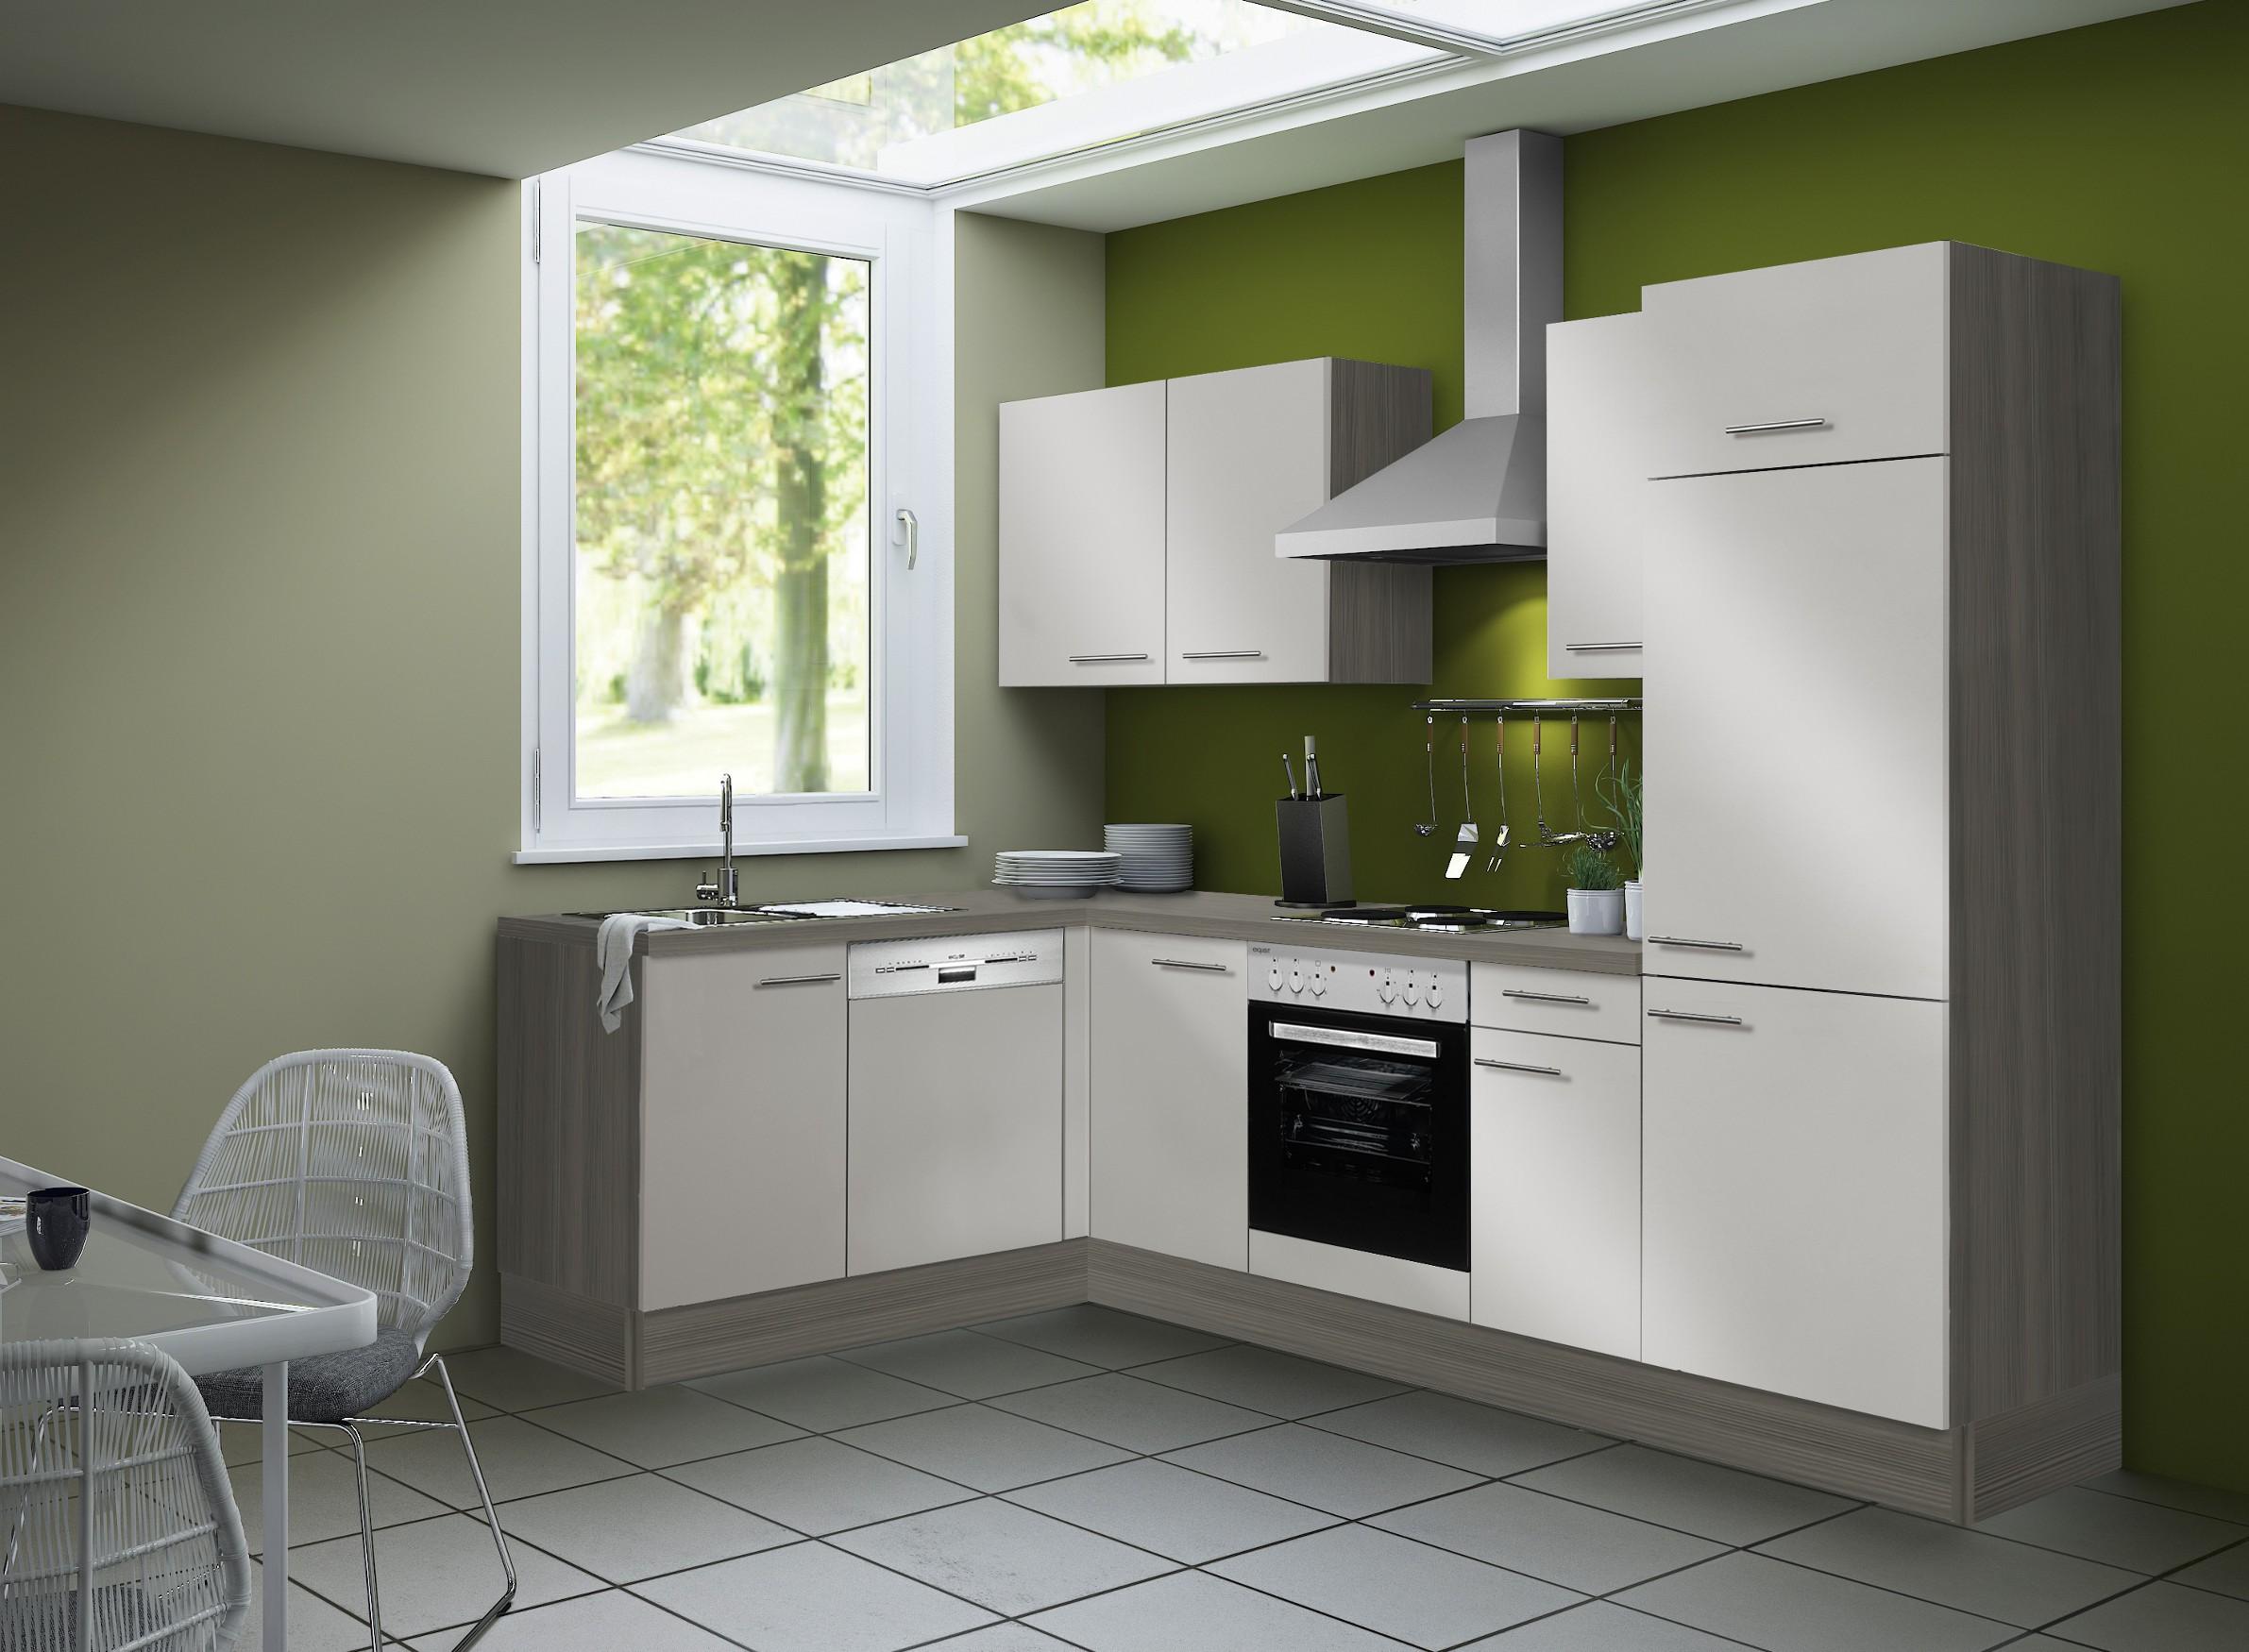 Full Size of Küche L Form Mit Elektrogeräten Küche L Form Mit E Geräte Küche L Form Modern Günstige Küche L Form Küche Küche L Form